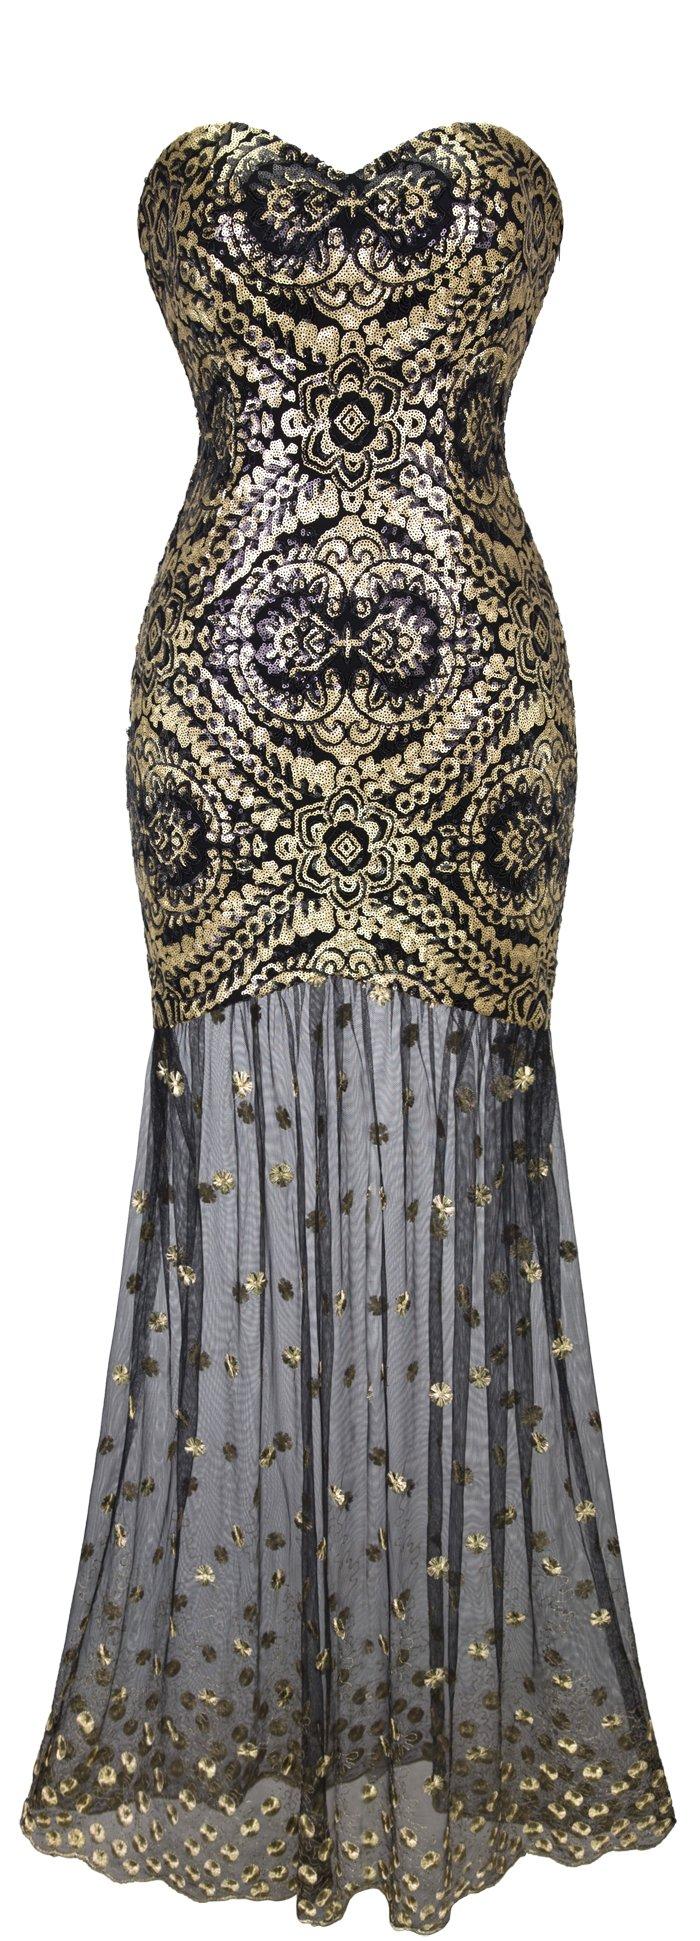 Angel-fashions Women's Sleeveless V-Neck Sequins Lace Up Patterned Prom Dress Medium